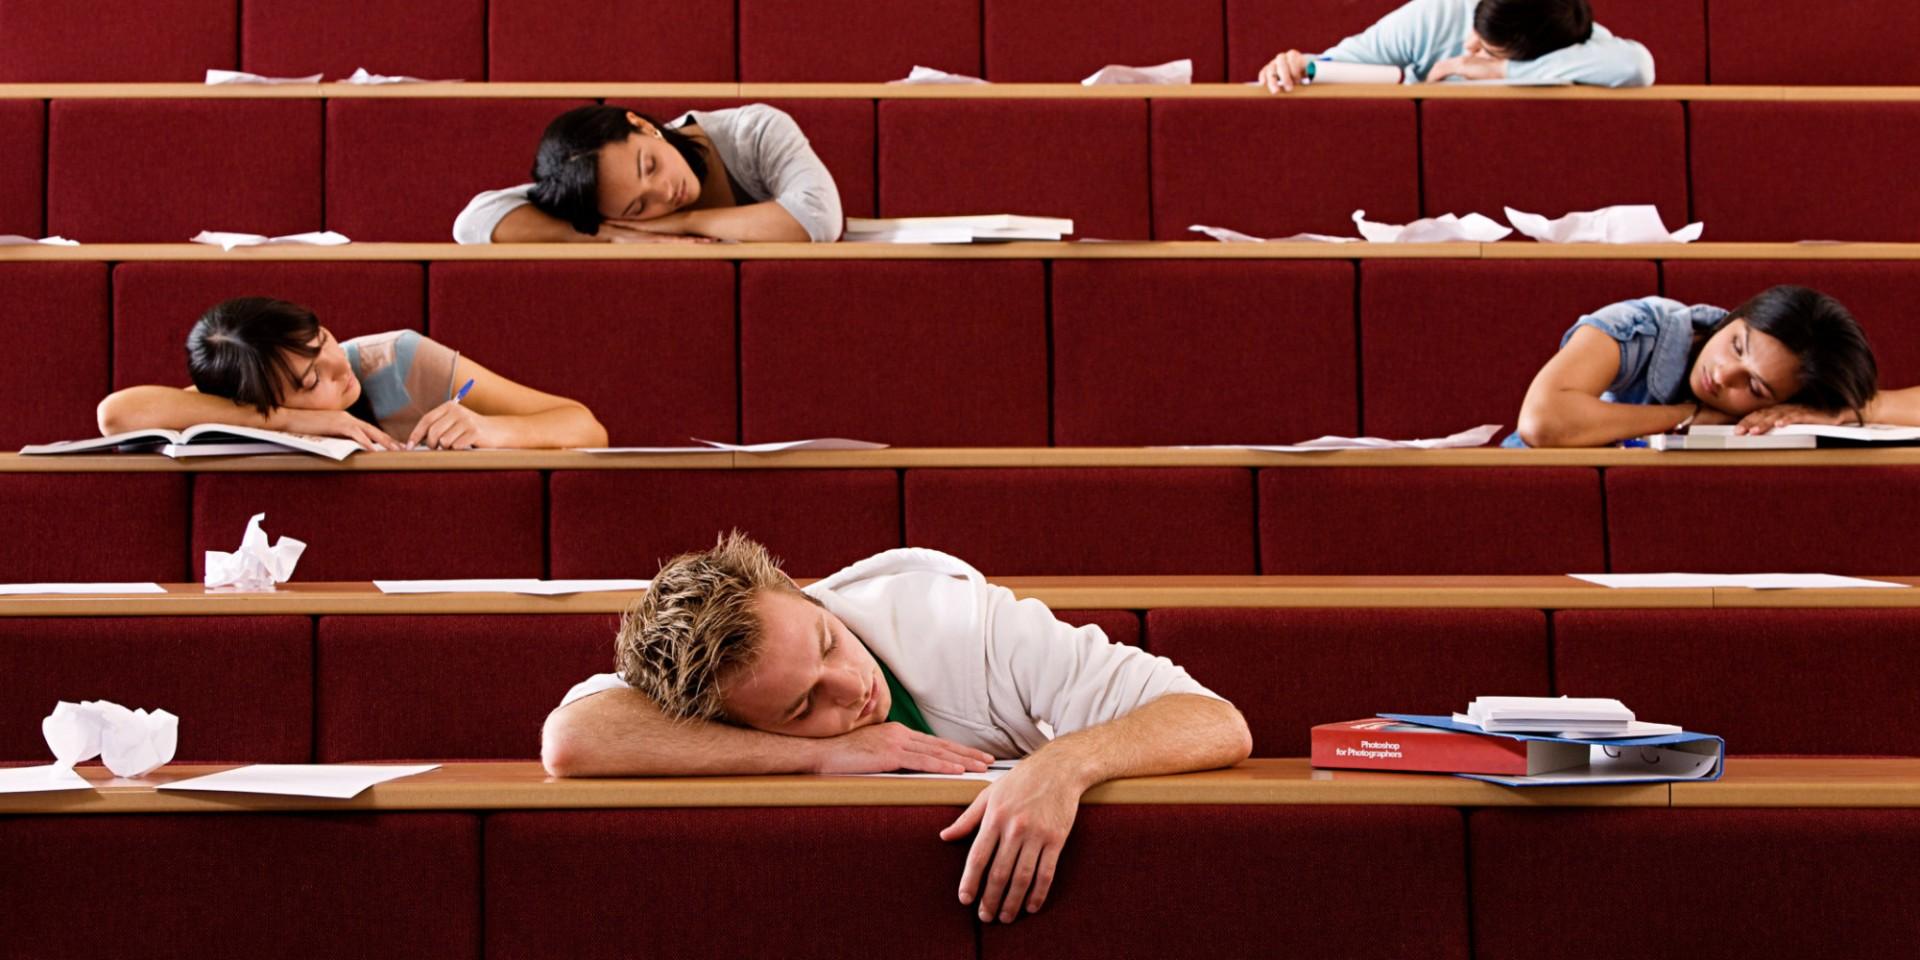 o-STUDENT-SLEEPING-facebok-1